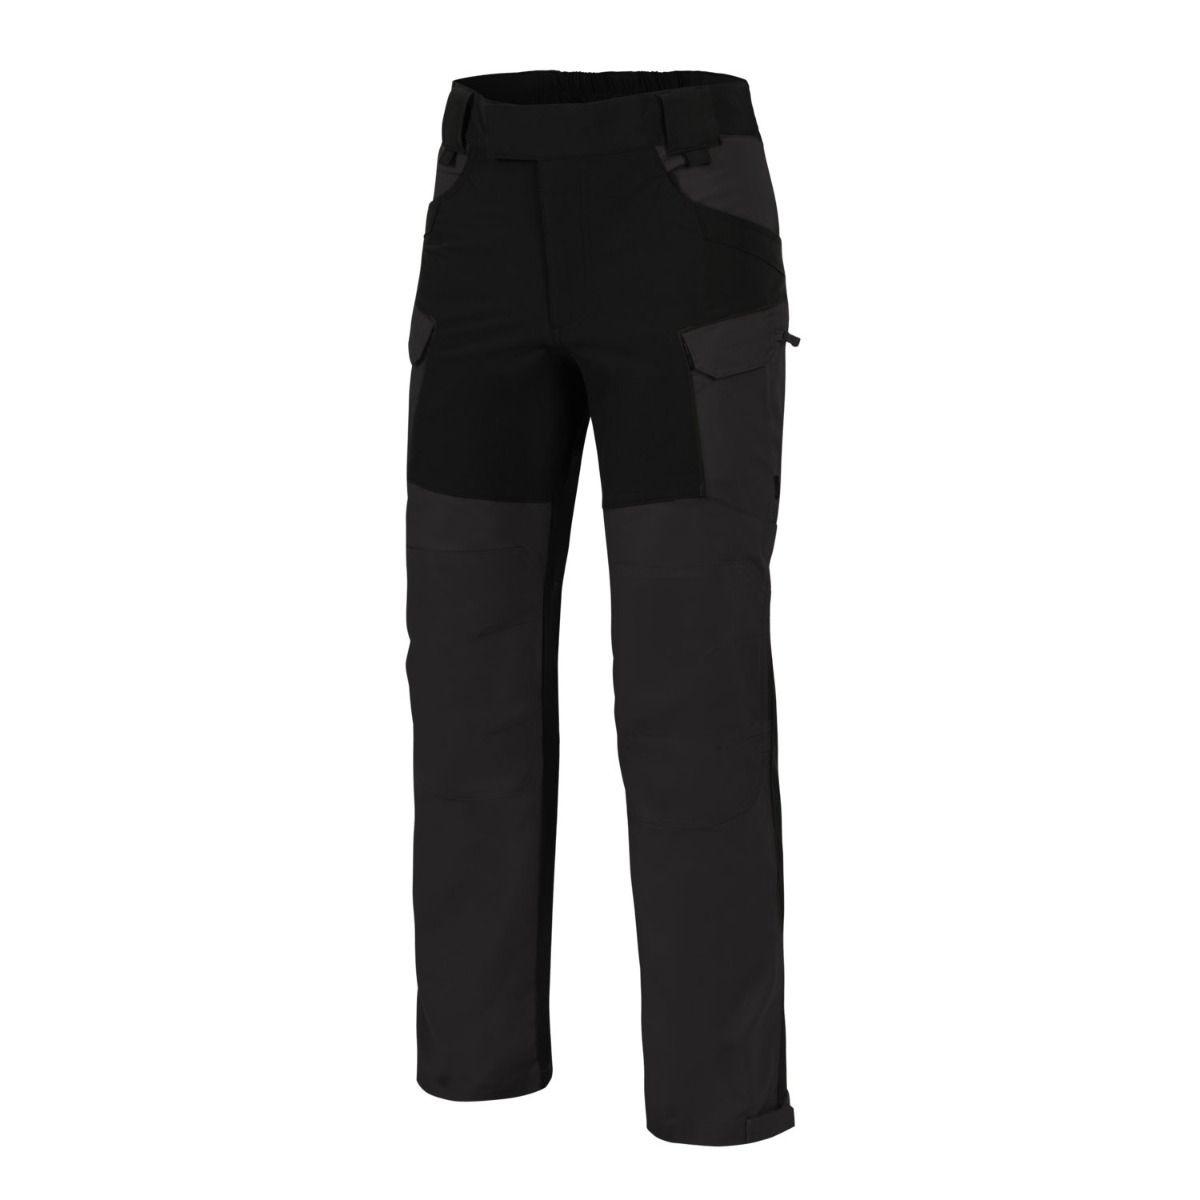 Helikon-Tex® HYBRID OUTBACK PANTS® - DURACANVAS® - ASH GREY / BLACK